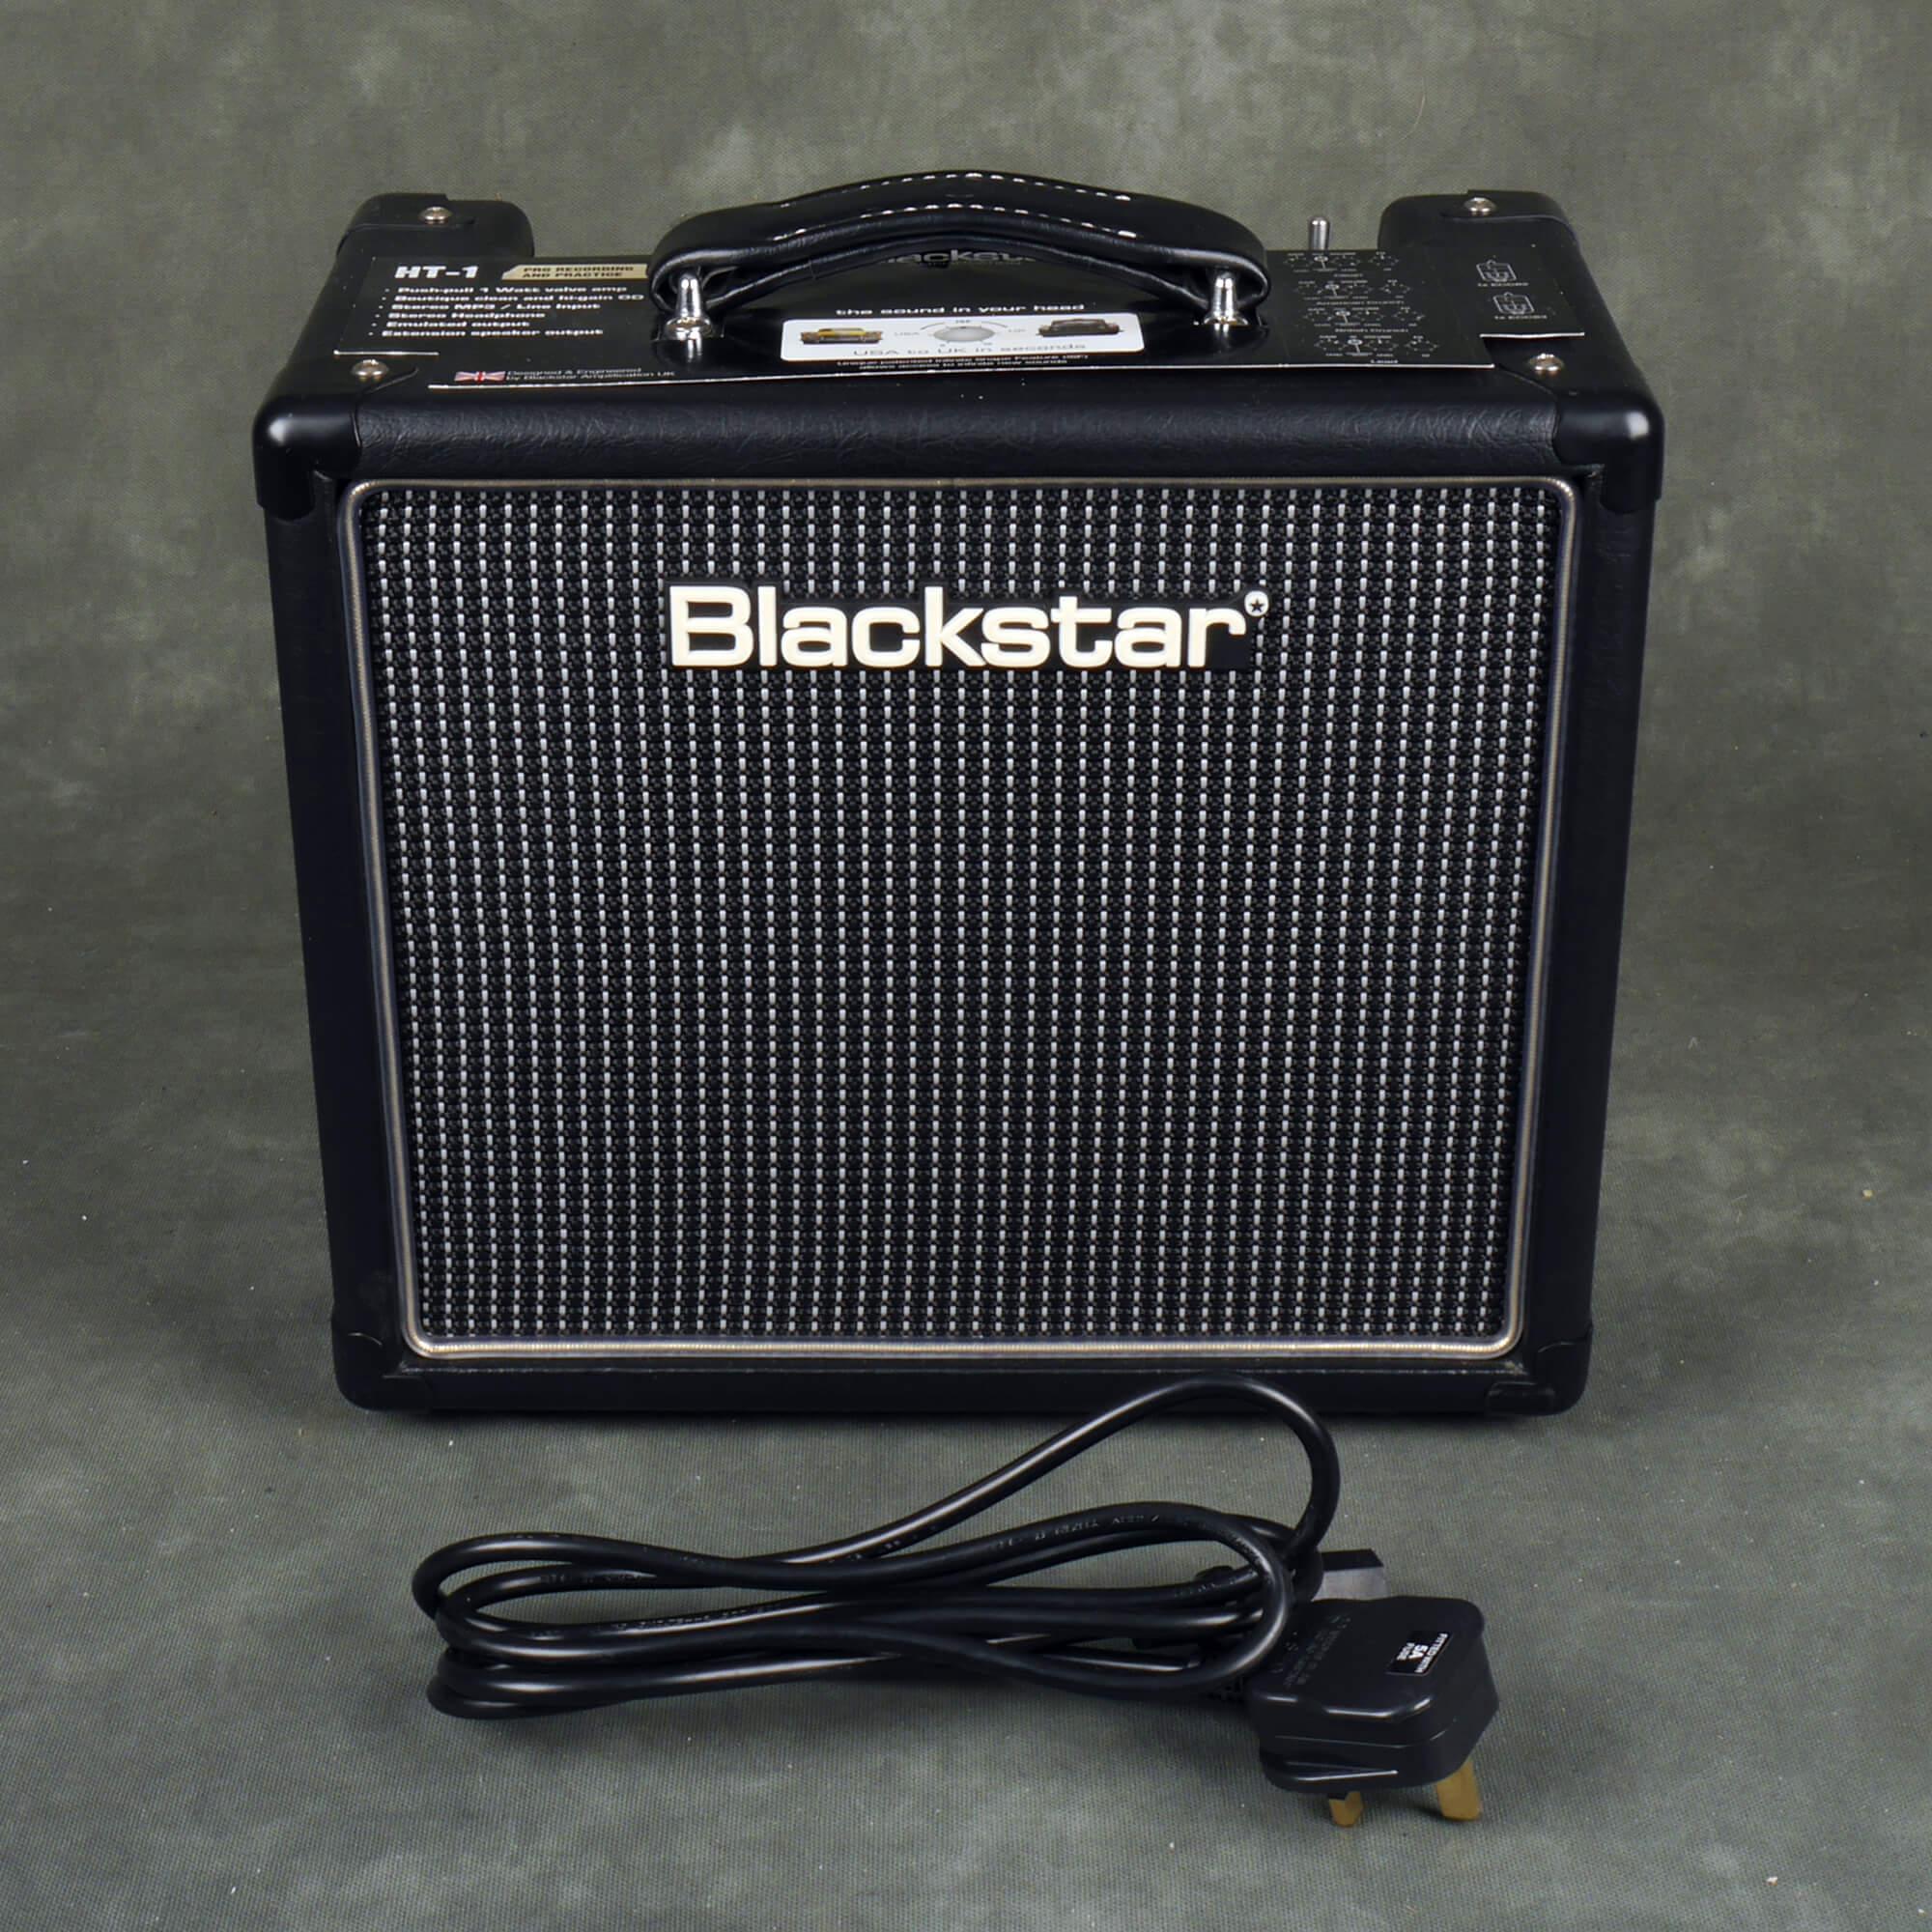 Blackstar HT-1 1 Watt Valve Guitar Amplifier - 2nd Hand